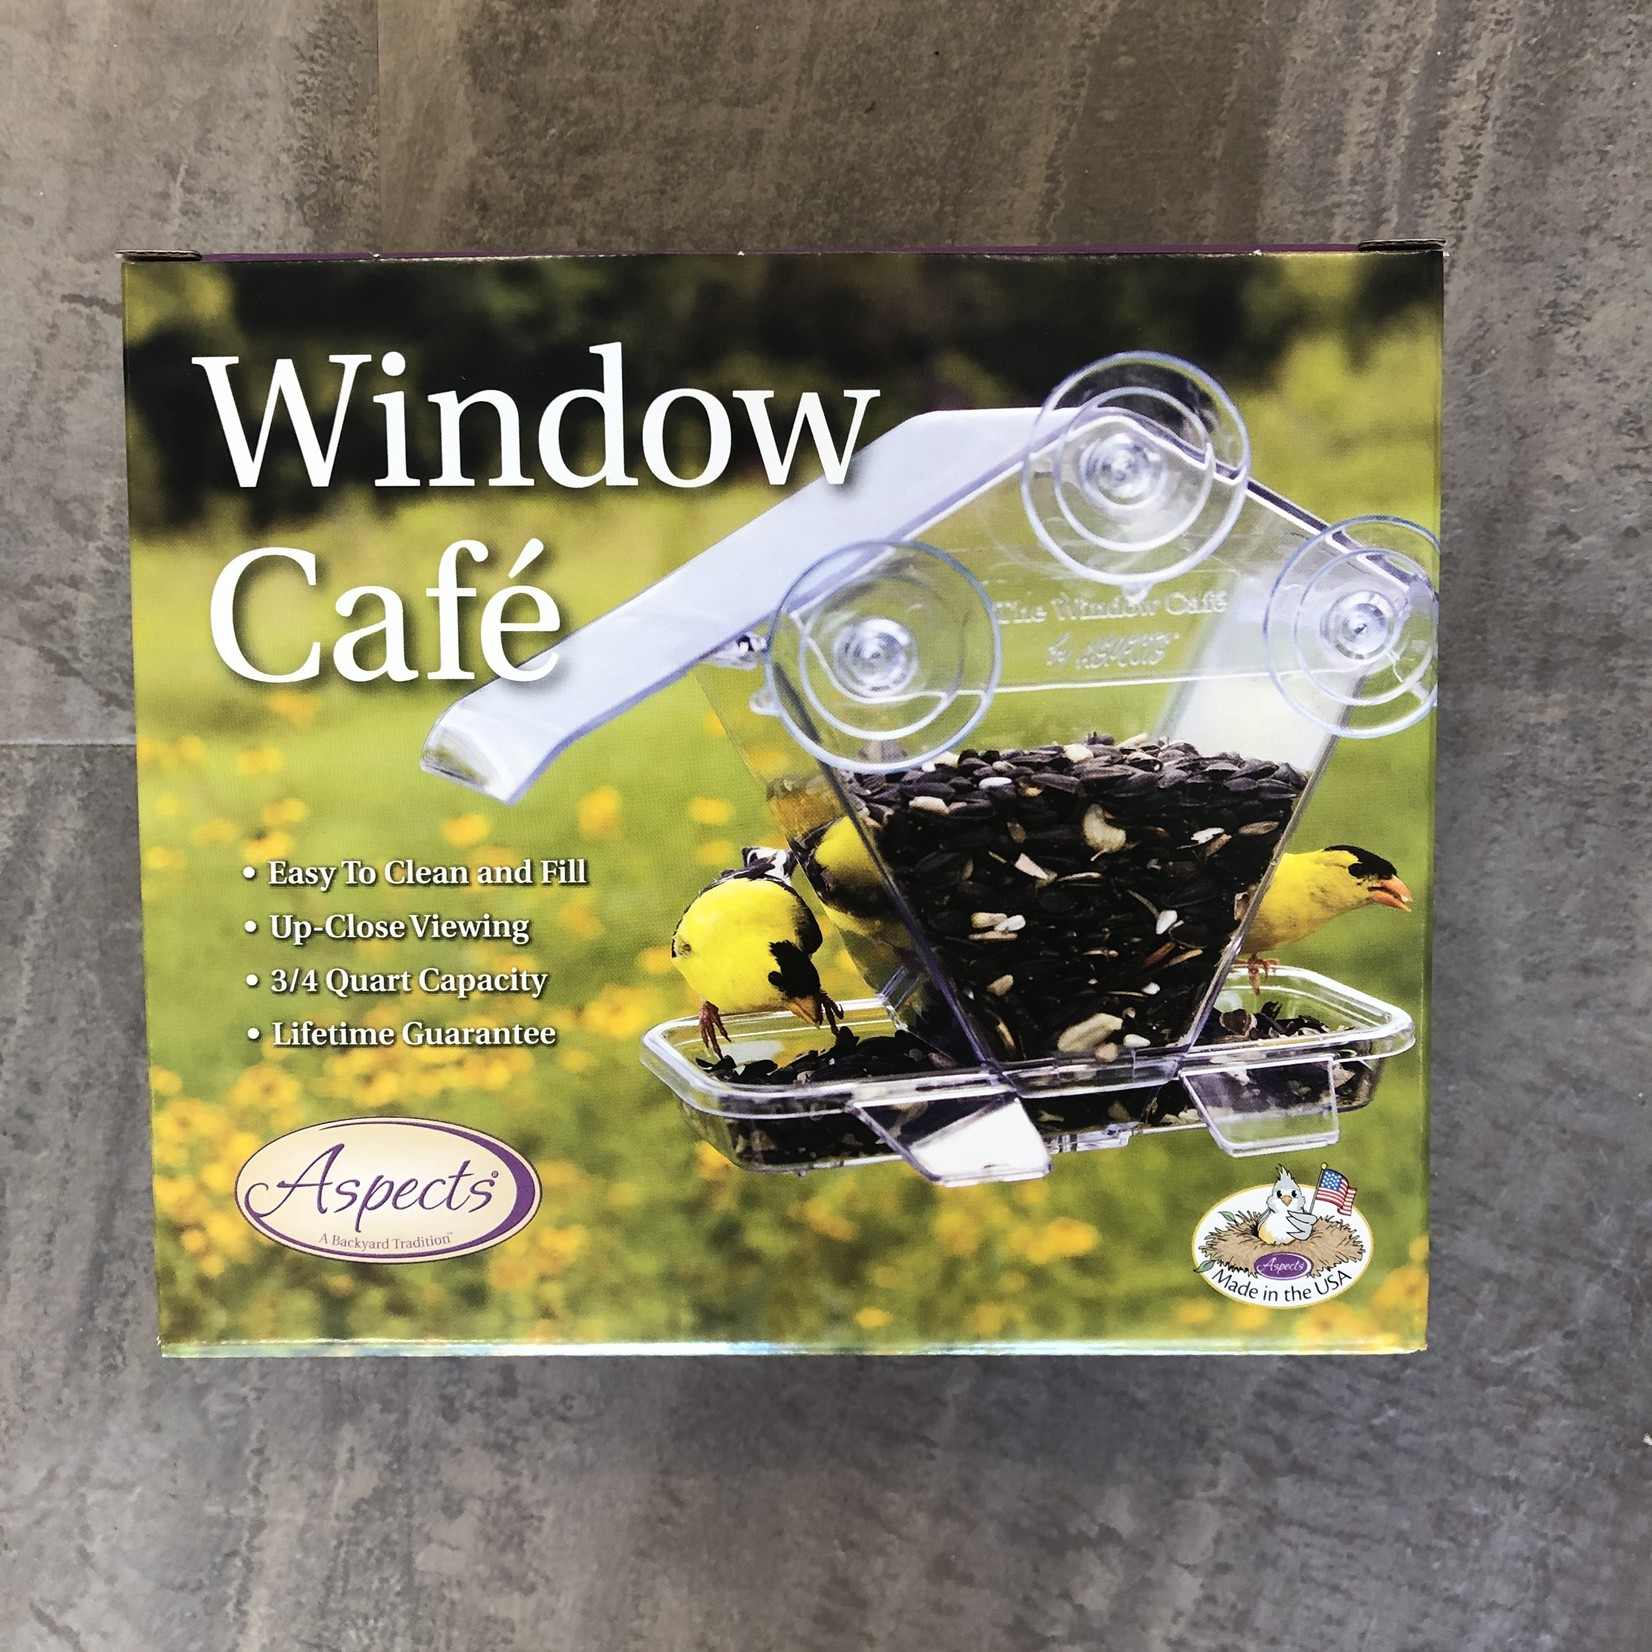 Aspects Window Cafe Feeder